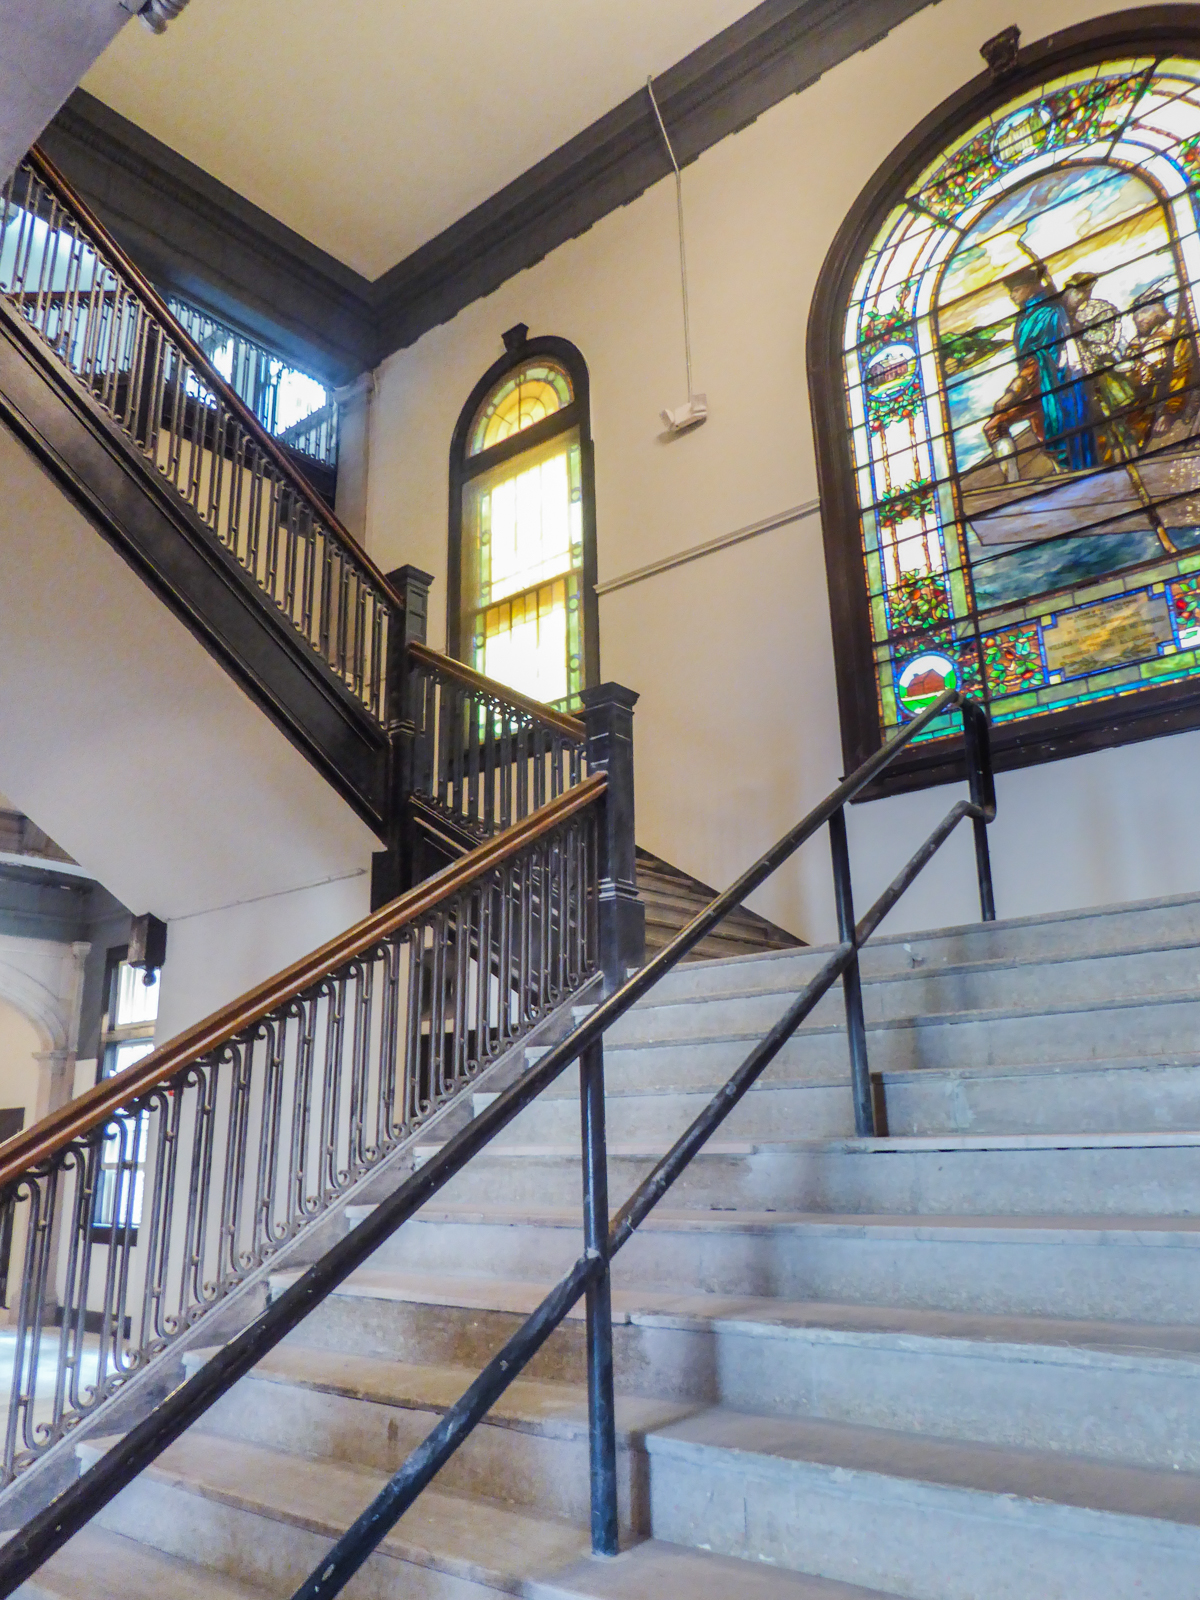 Alumni Lofts Historic Stair 1